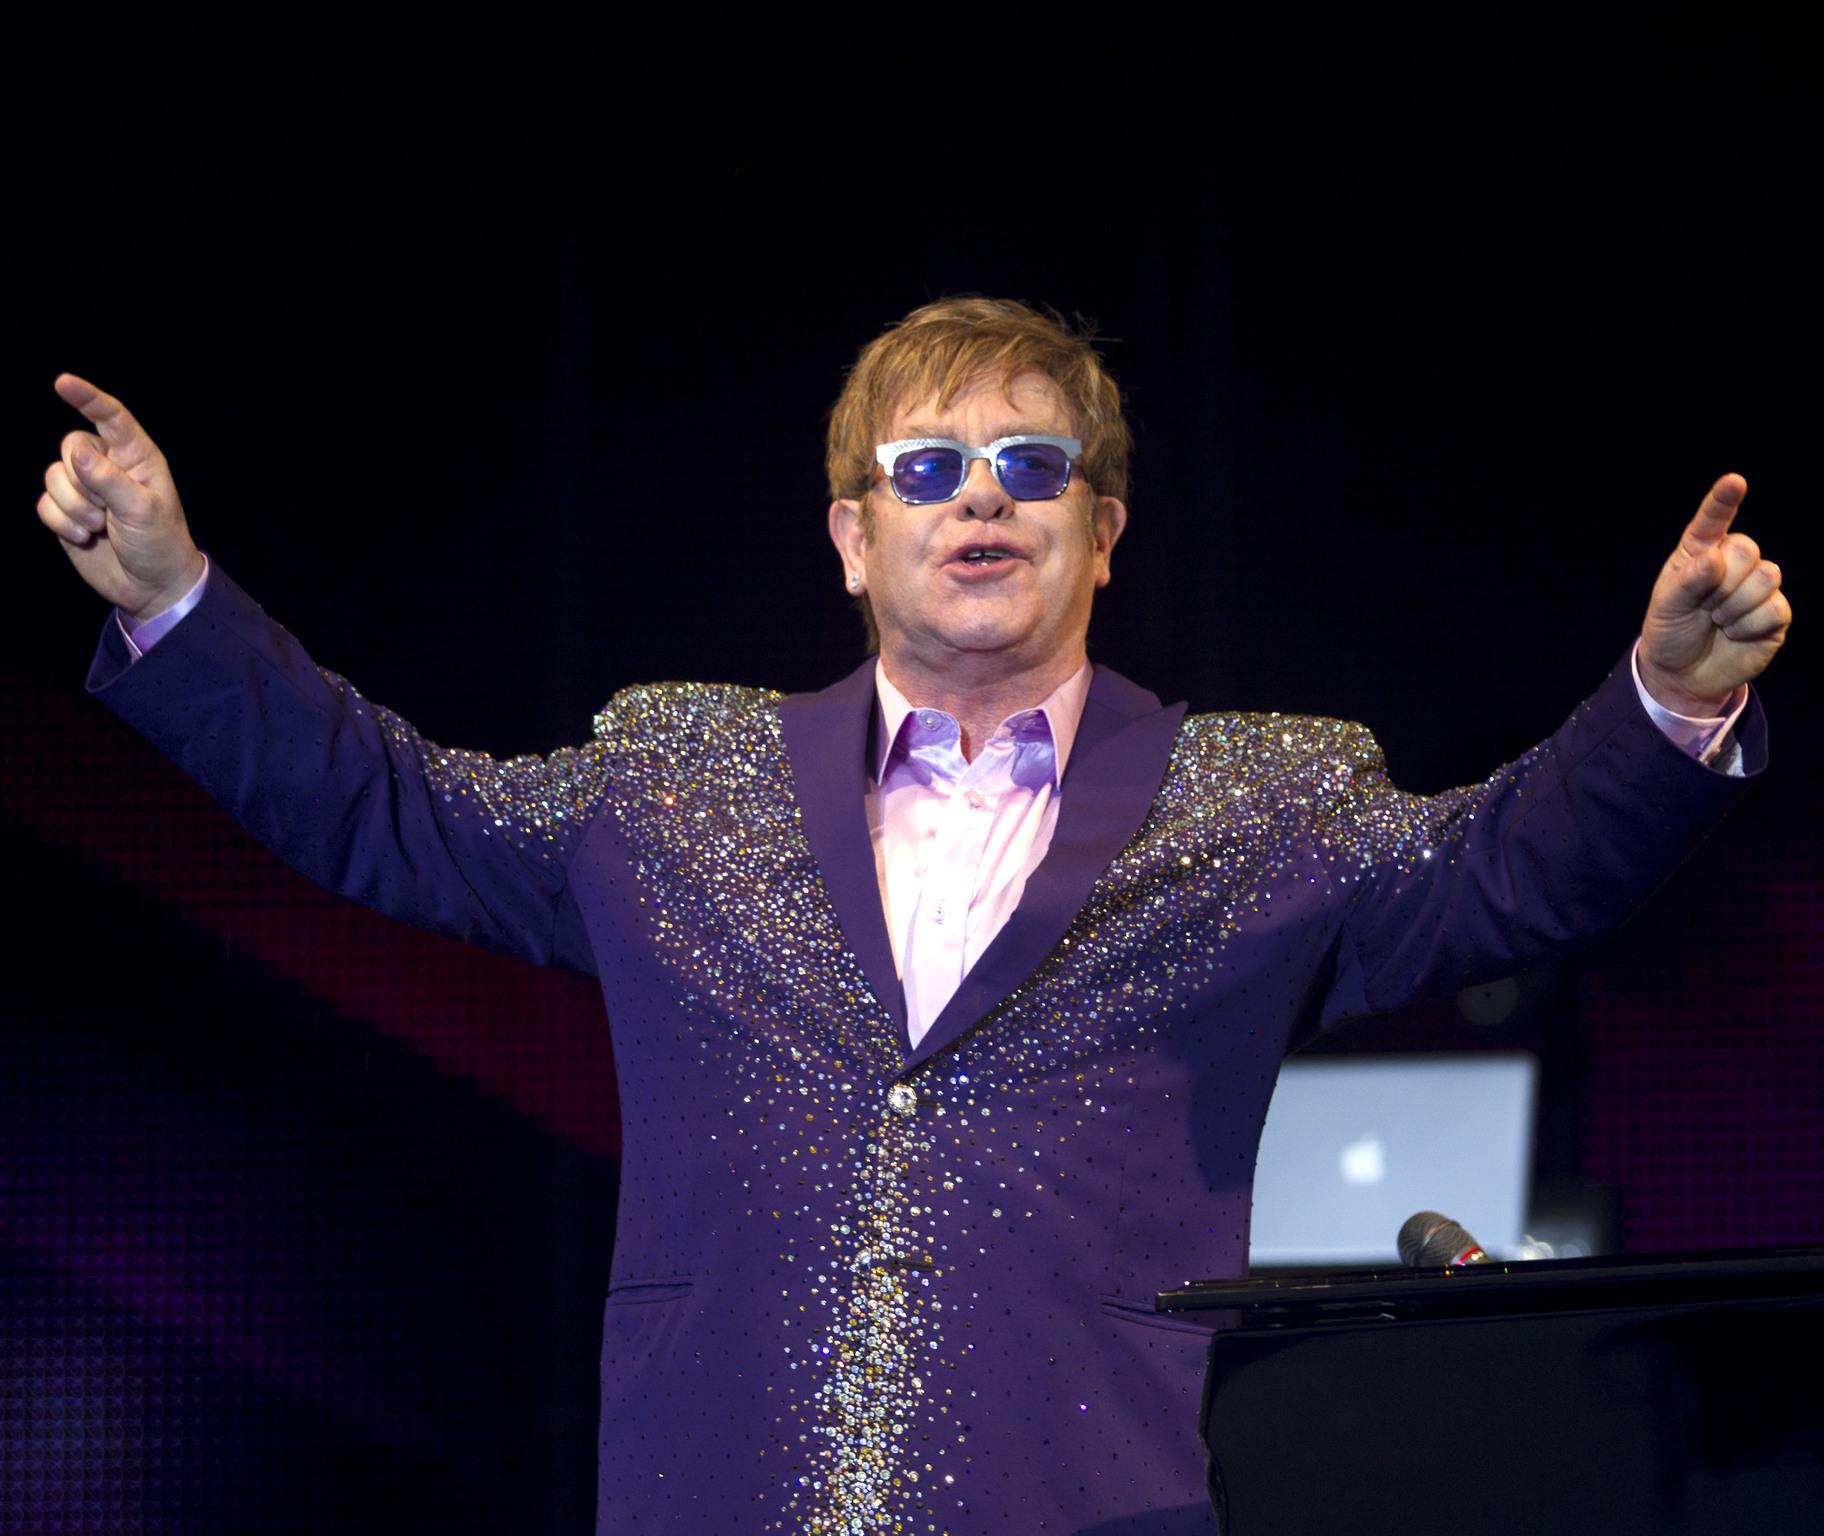 On Elton John: